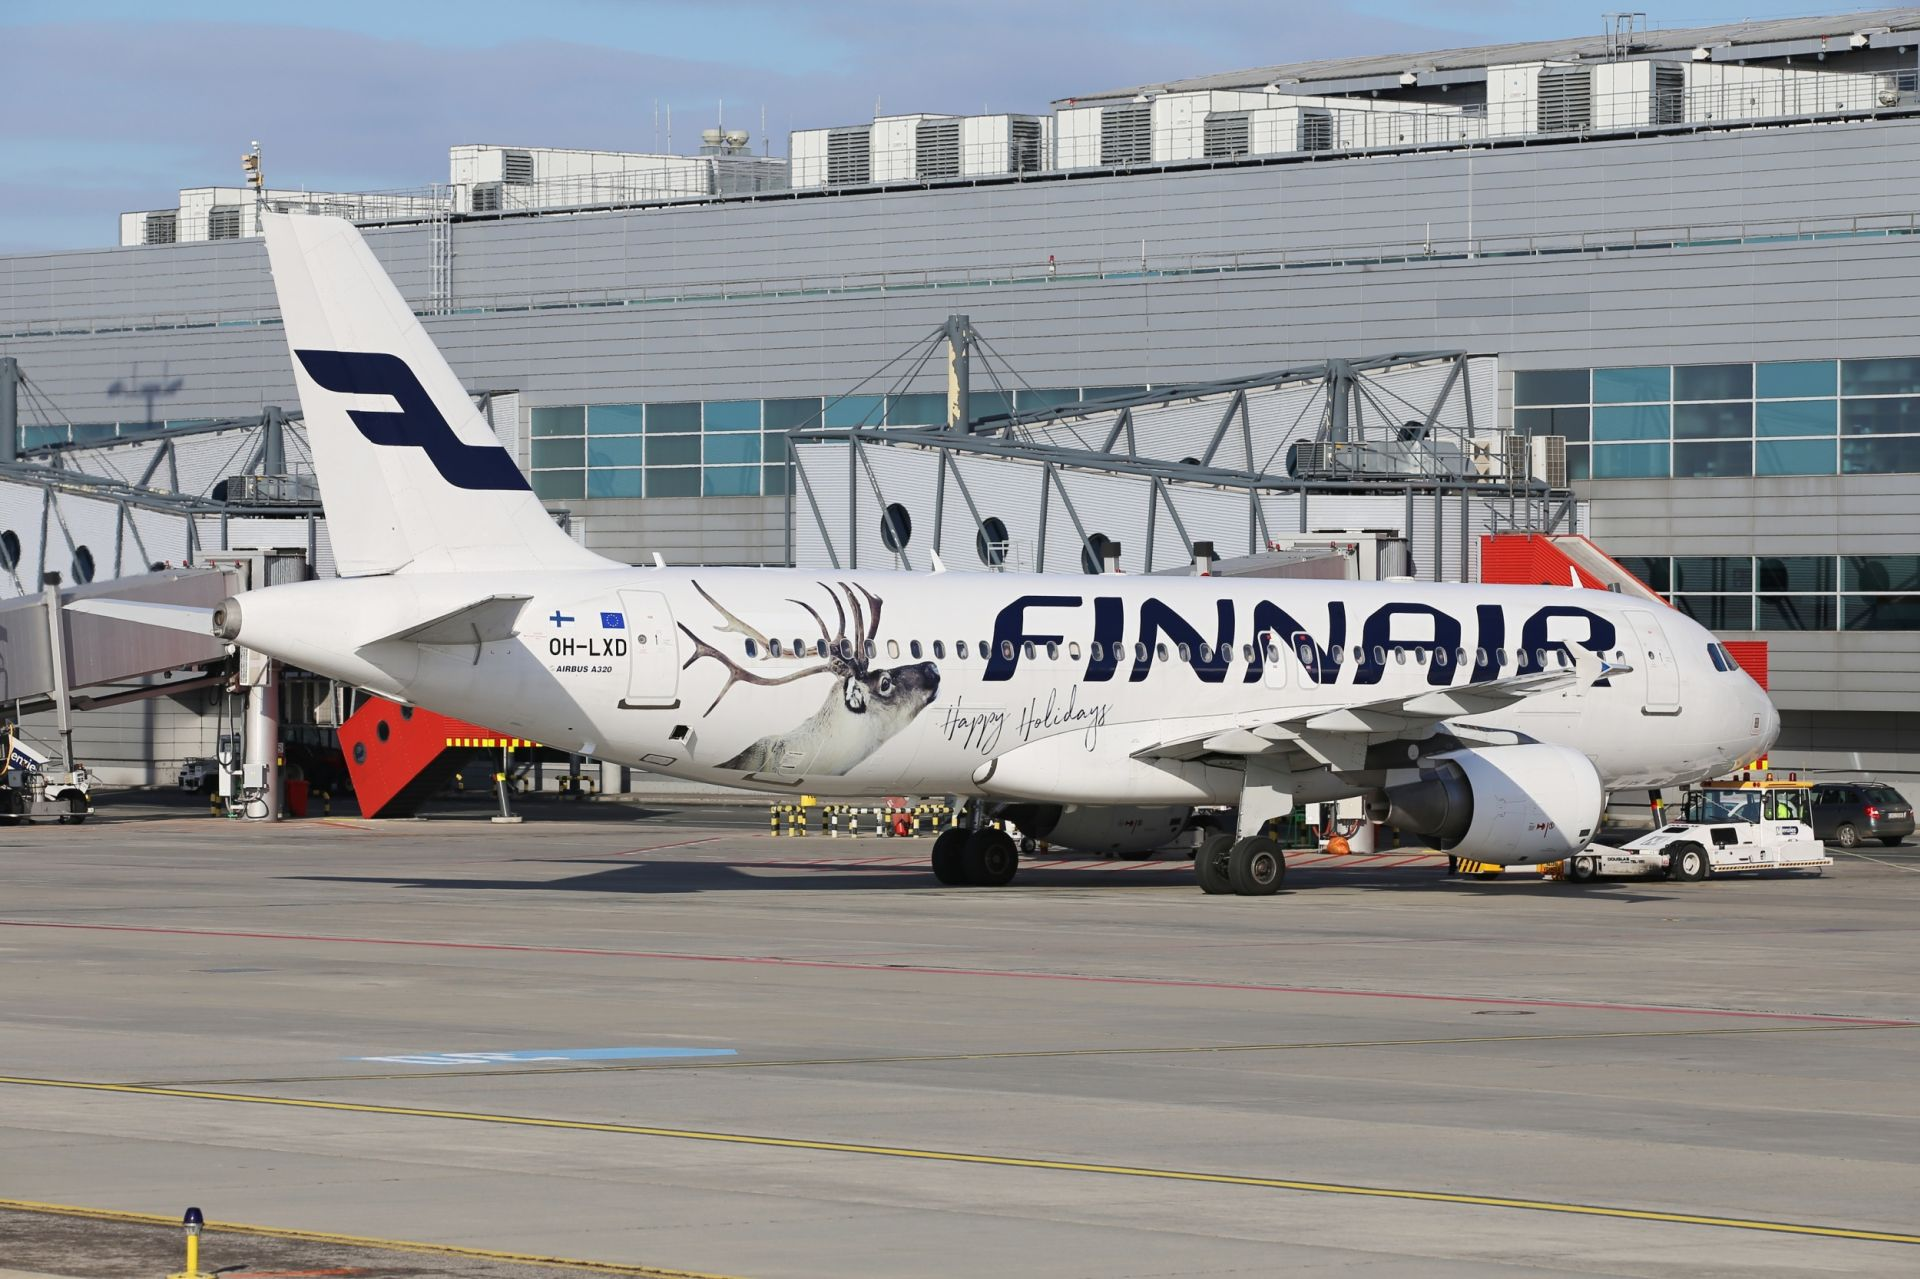 A320 společnosti Finnair v Praze. Foto: Letiště Praha